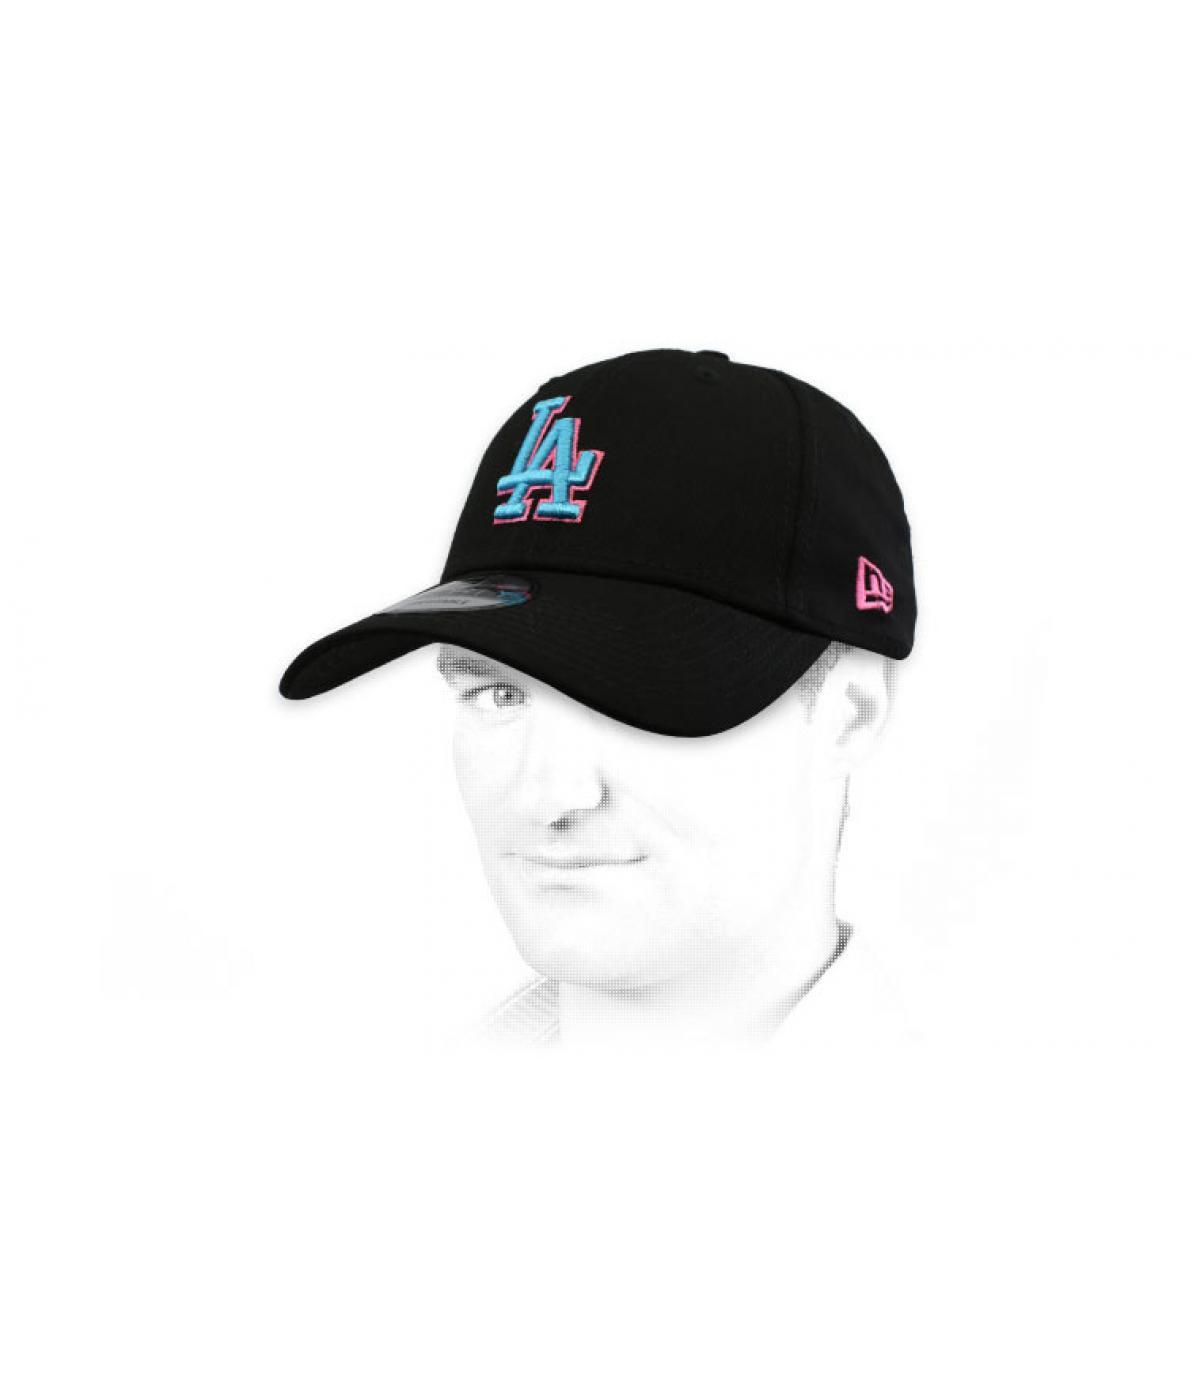 gorra LA negro azul